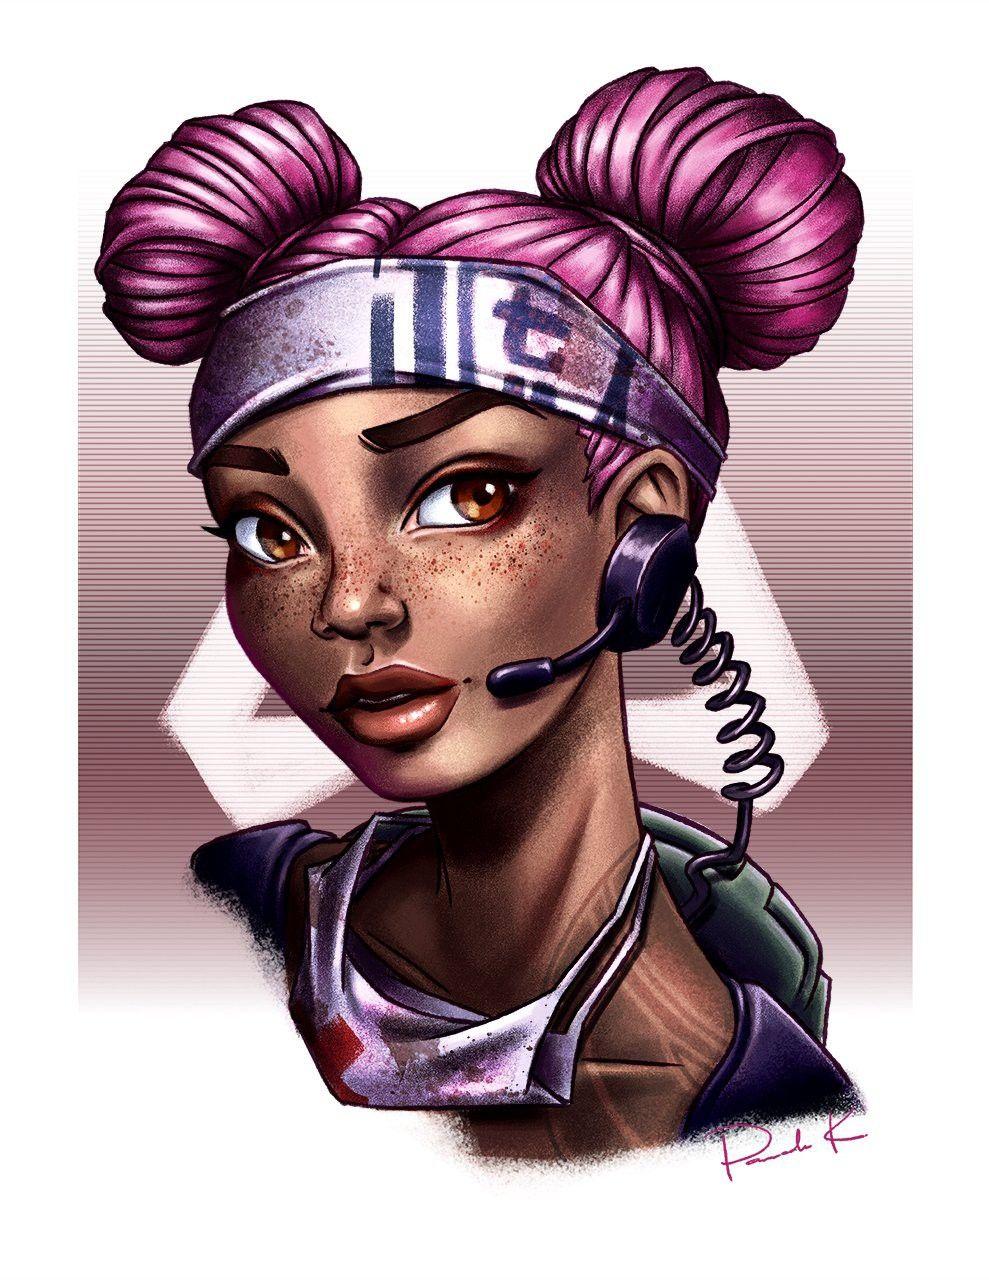 Pin by Paul Robertson on Apex in 2020 Gamer girl, Black